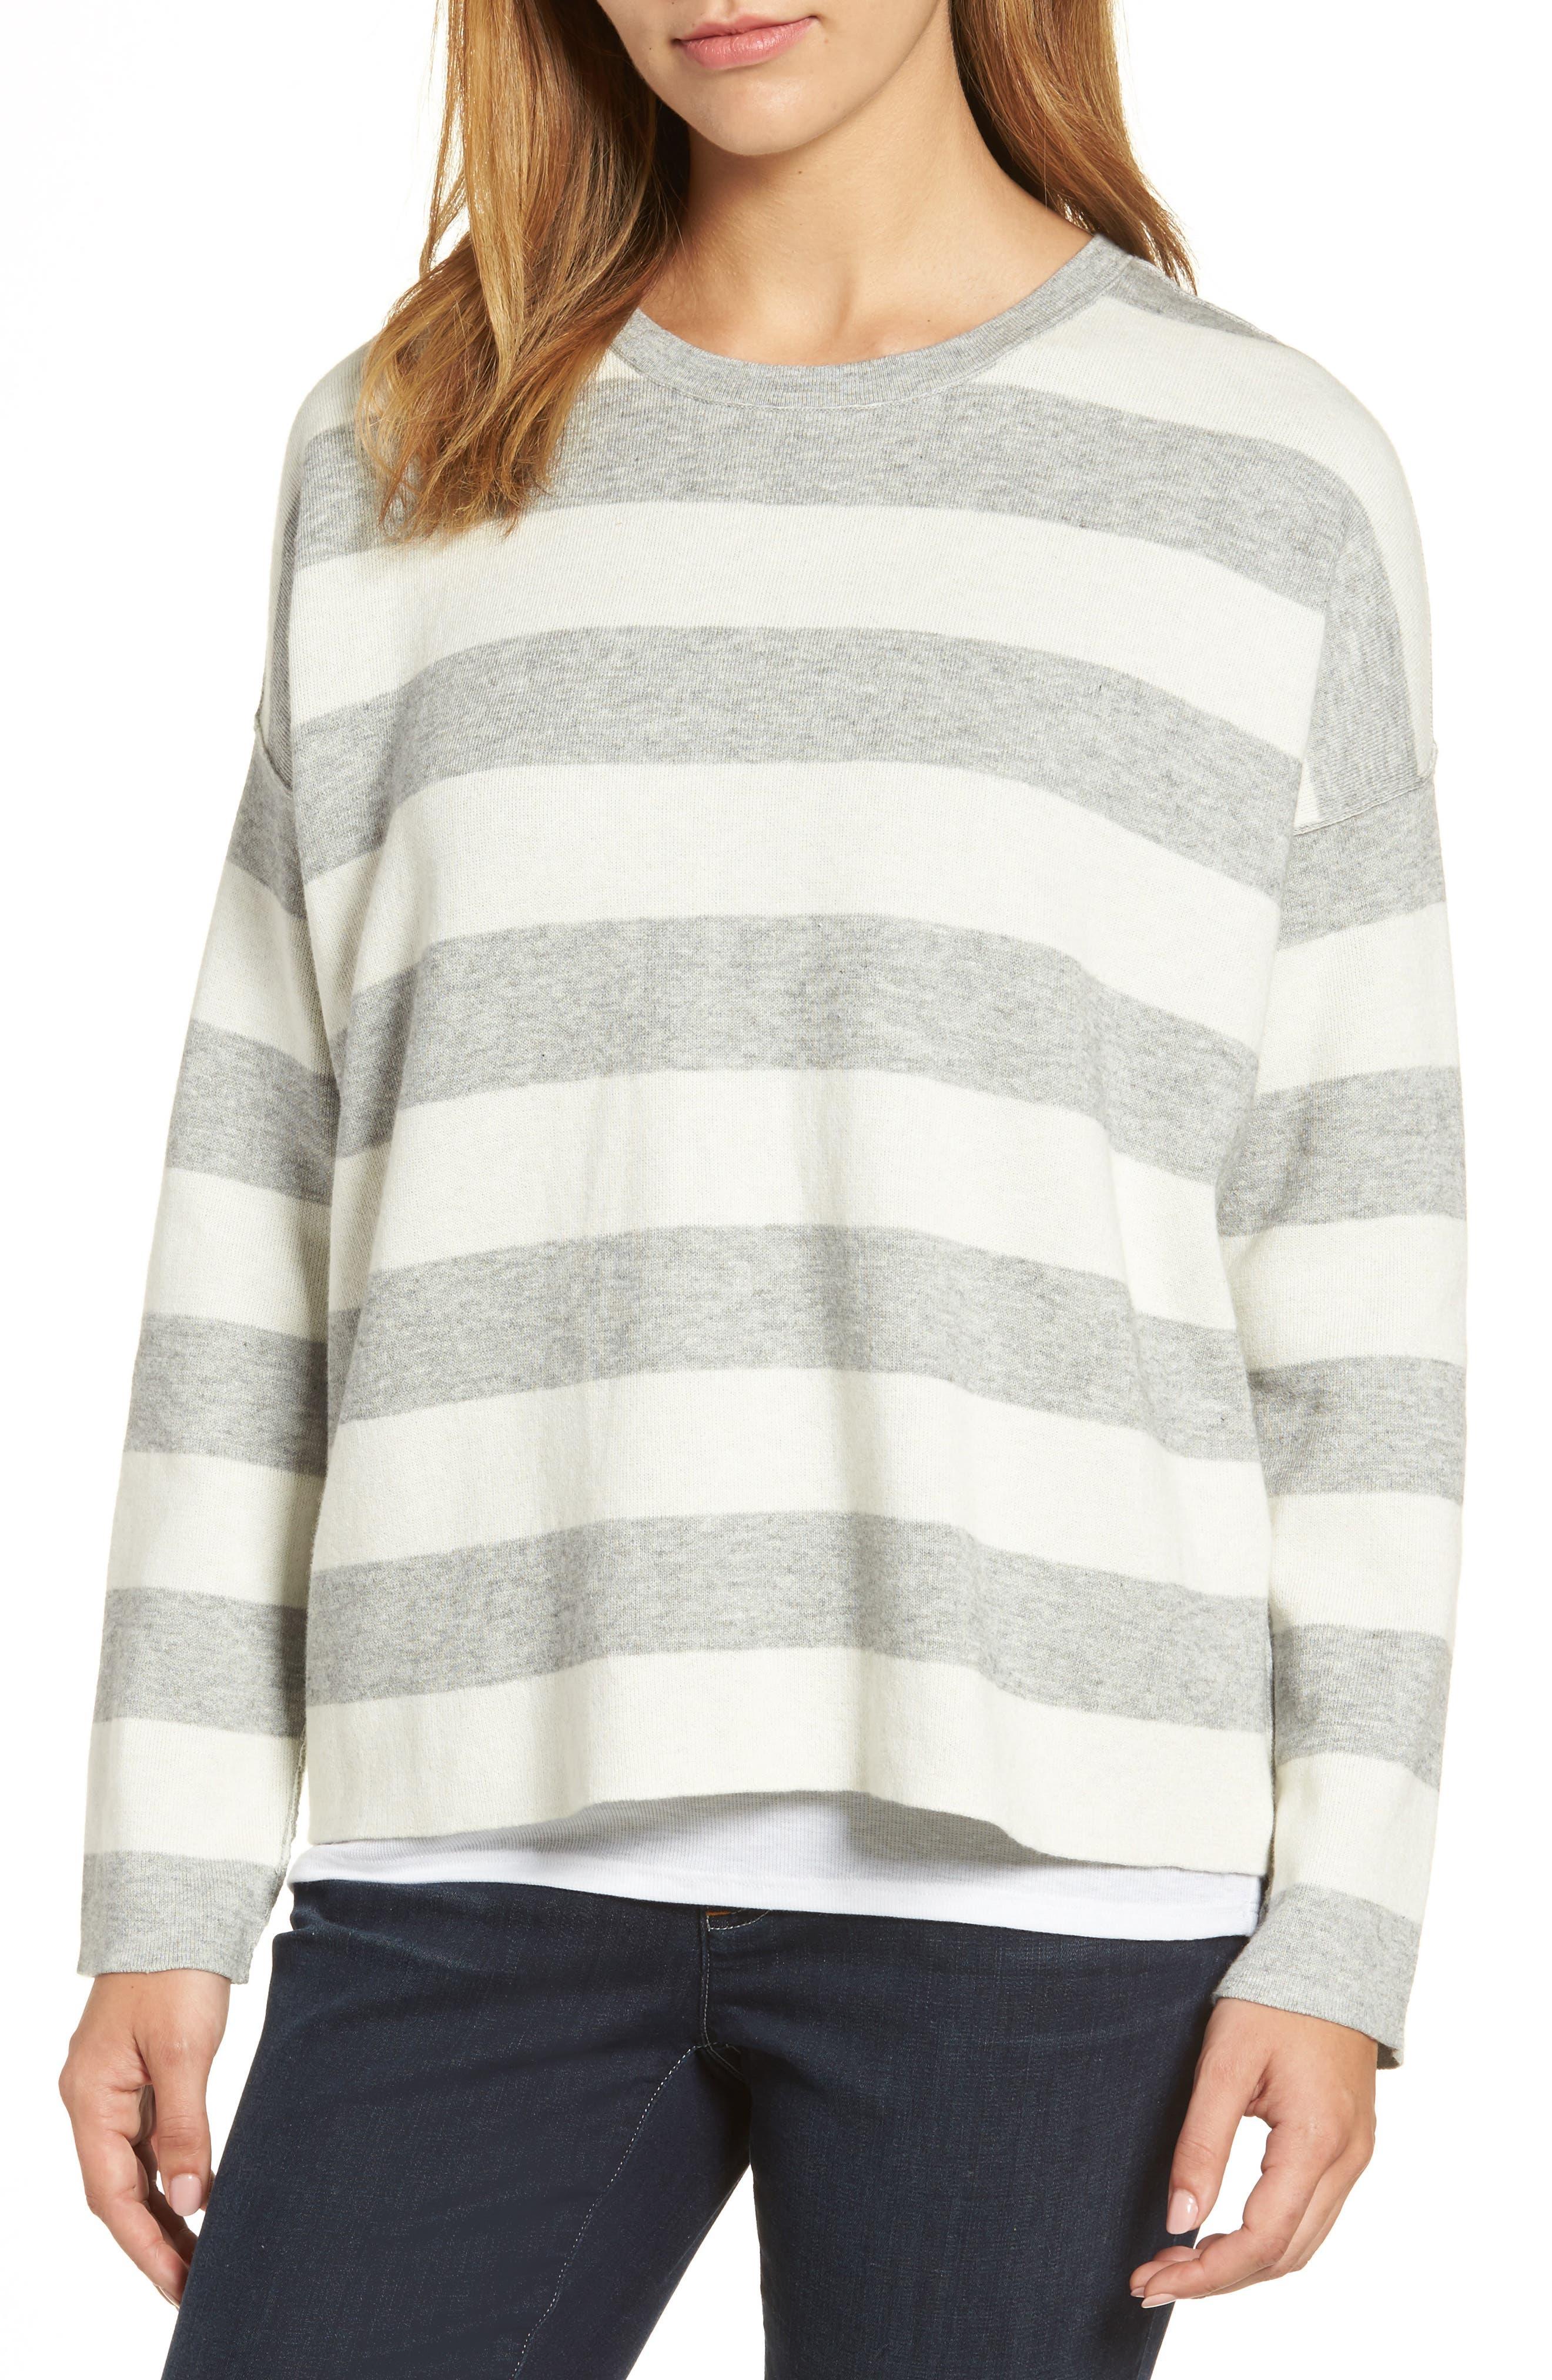 Main Image - Eileen Fisher Stripe Organic Cotton Blend Top